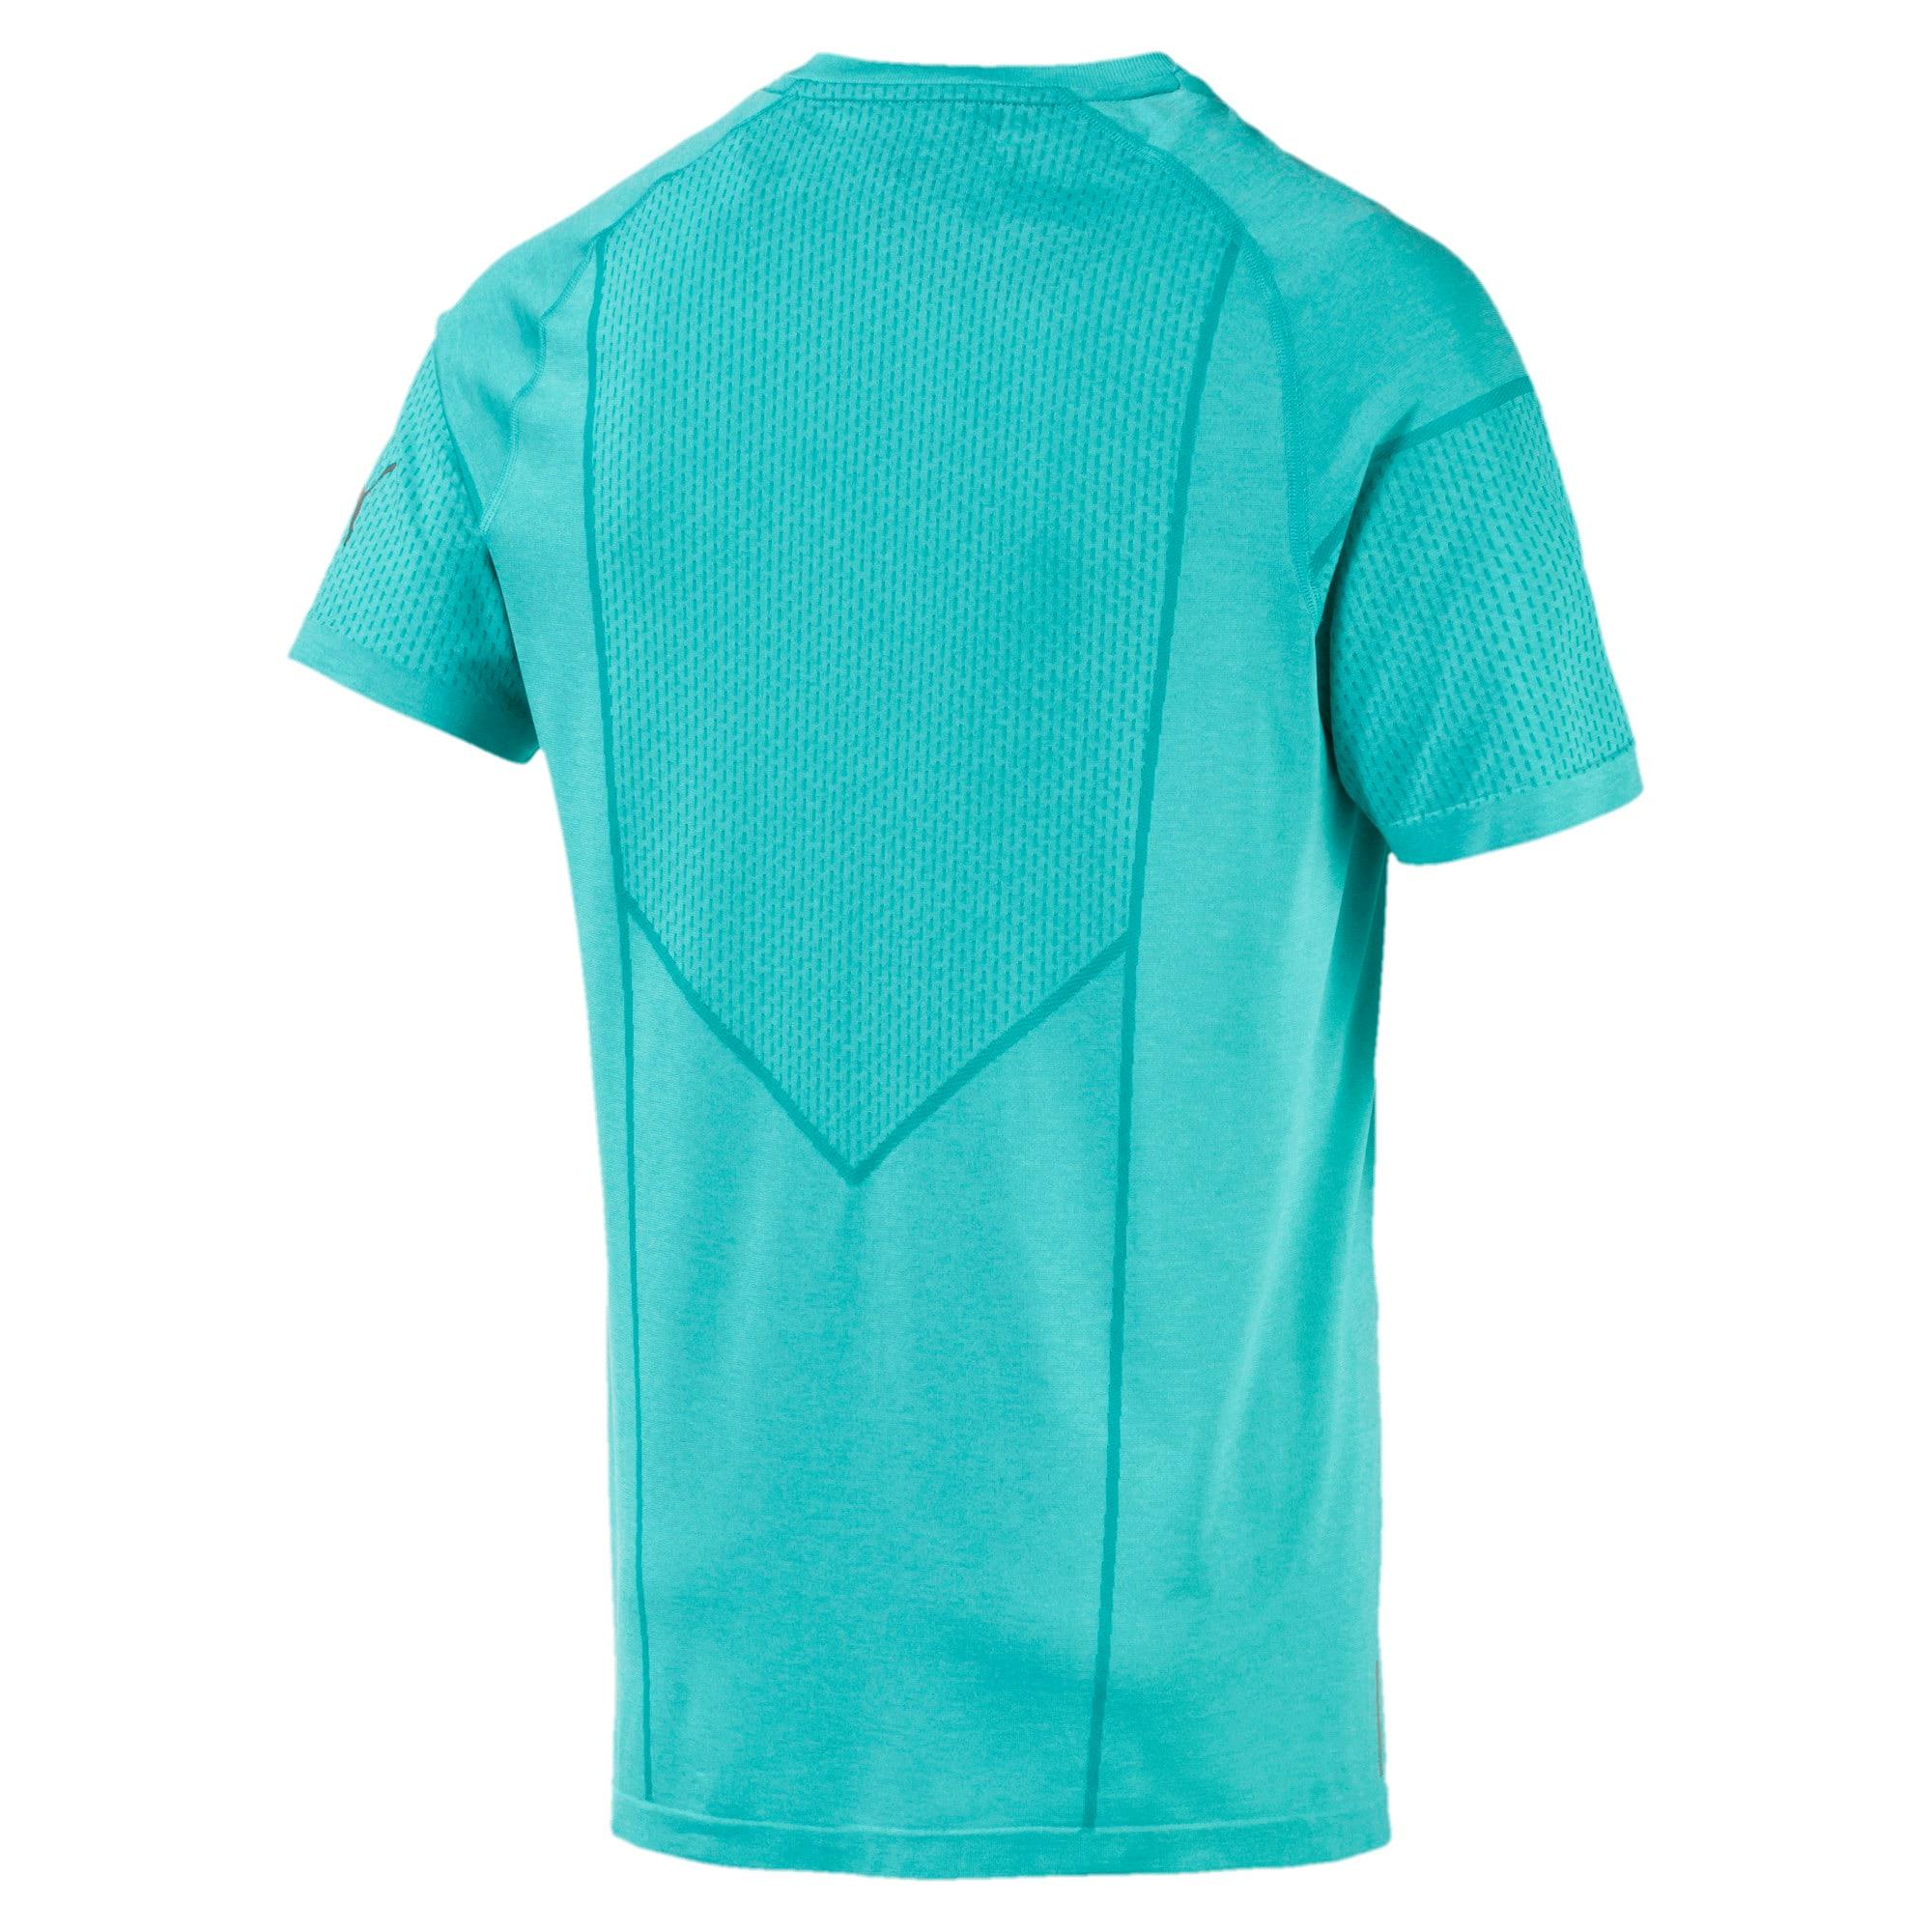 Thumbnail 5 of Reactive evoKNIT Herren T-Shirt, Blue Turquoise Heather, medium